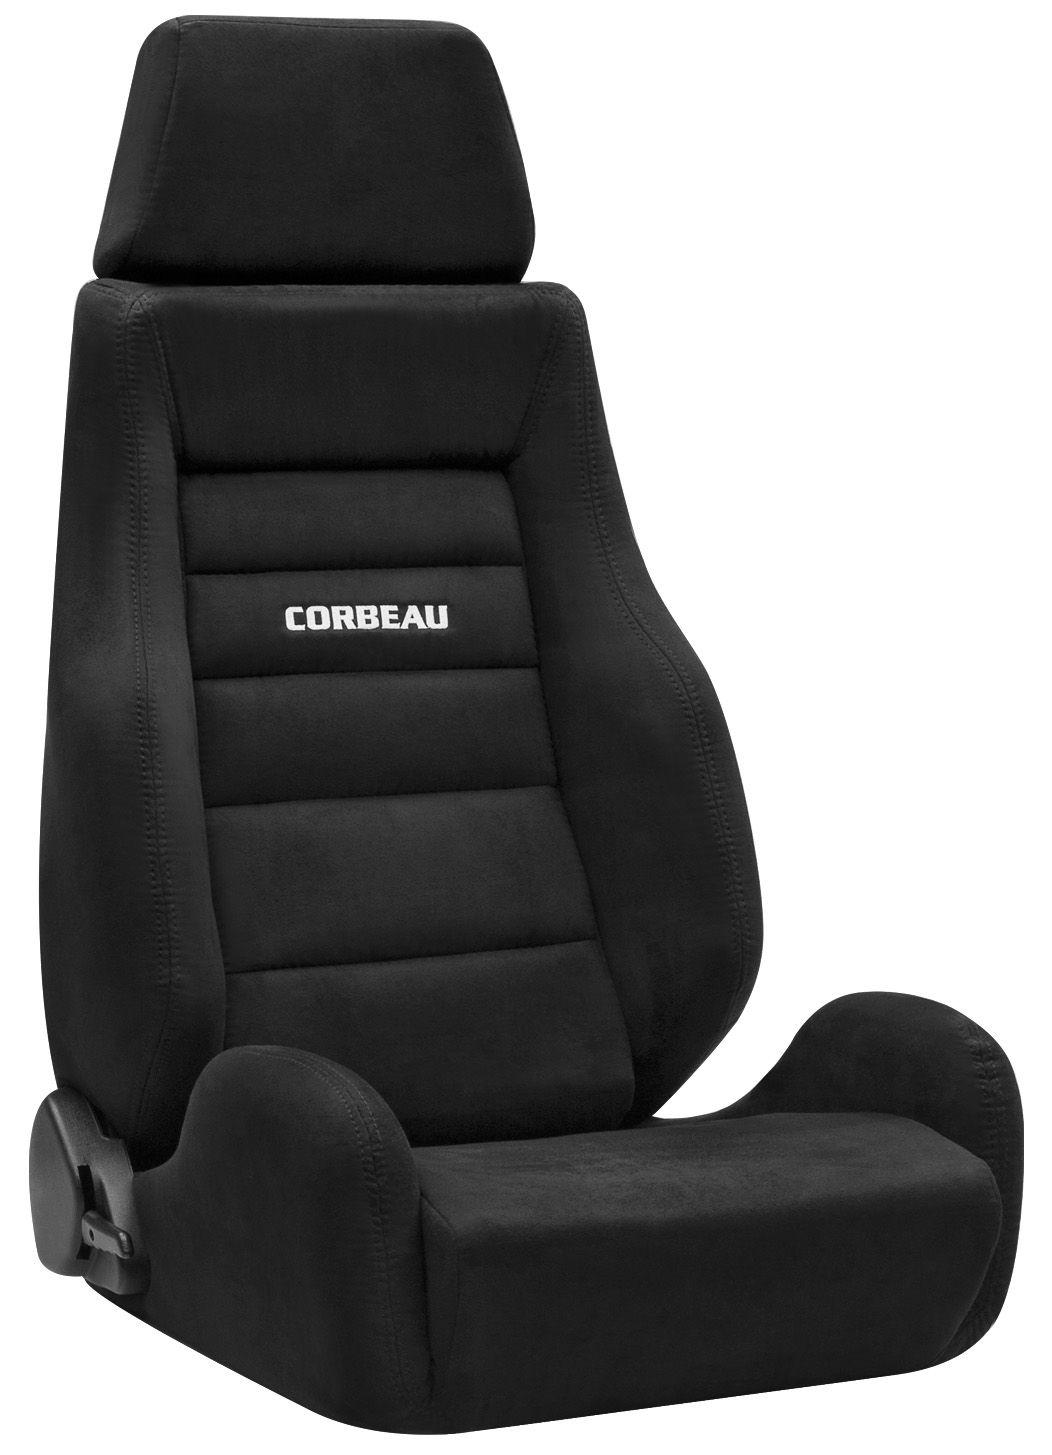 Pro Touring Seats - Corbeau GTS II - Reclining - Adjustable